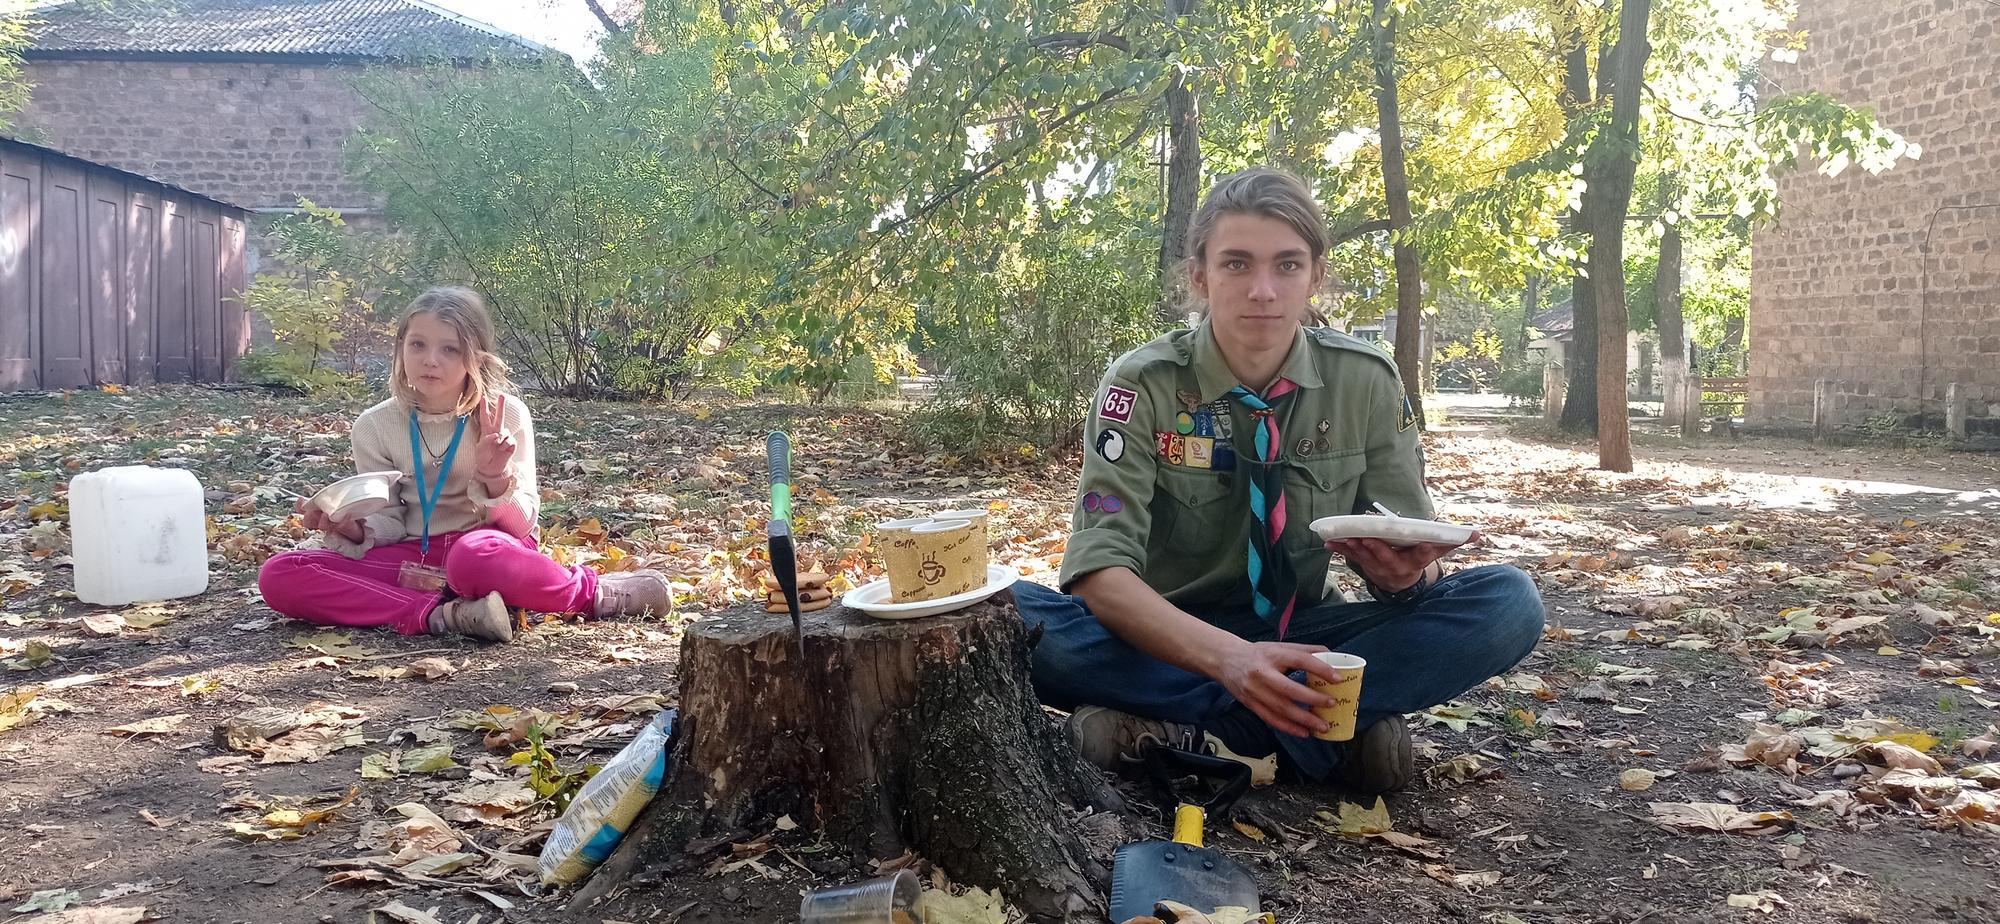 пластуни з Краматорська їдять куліш